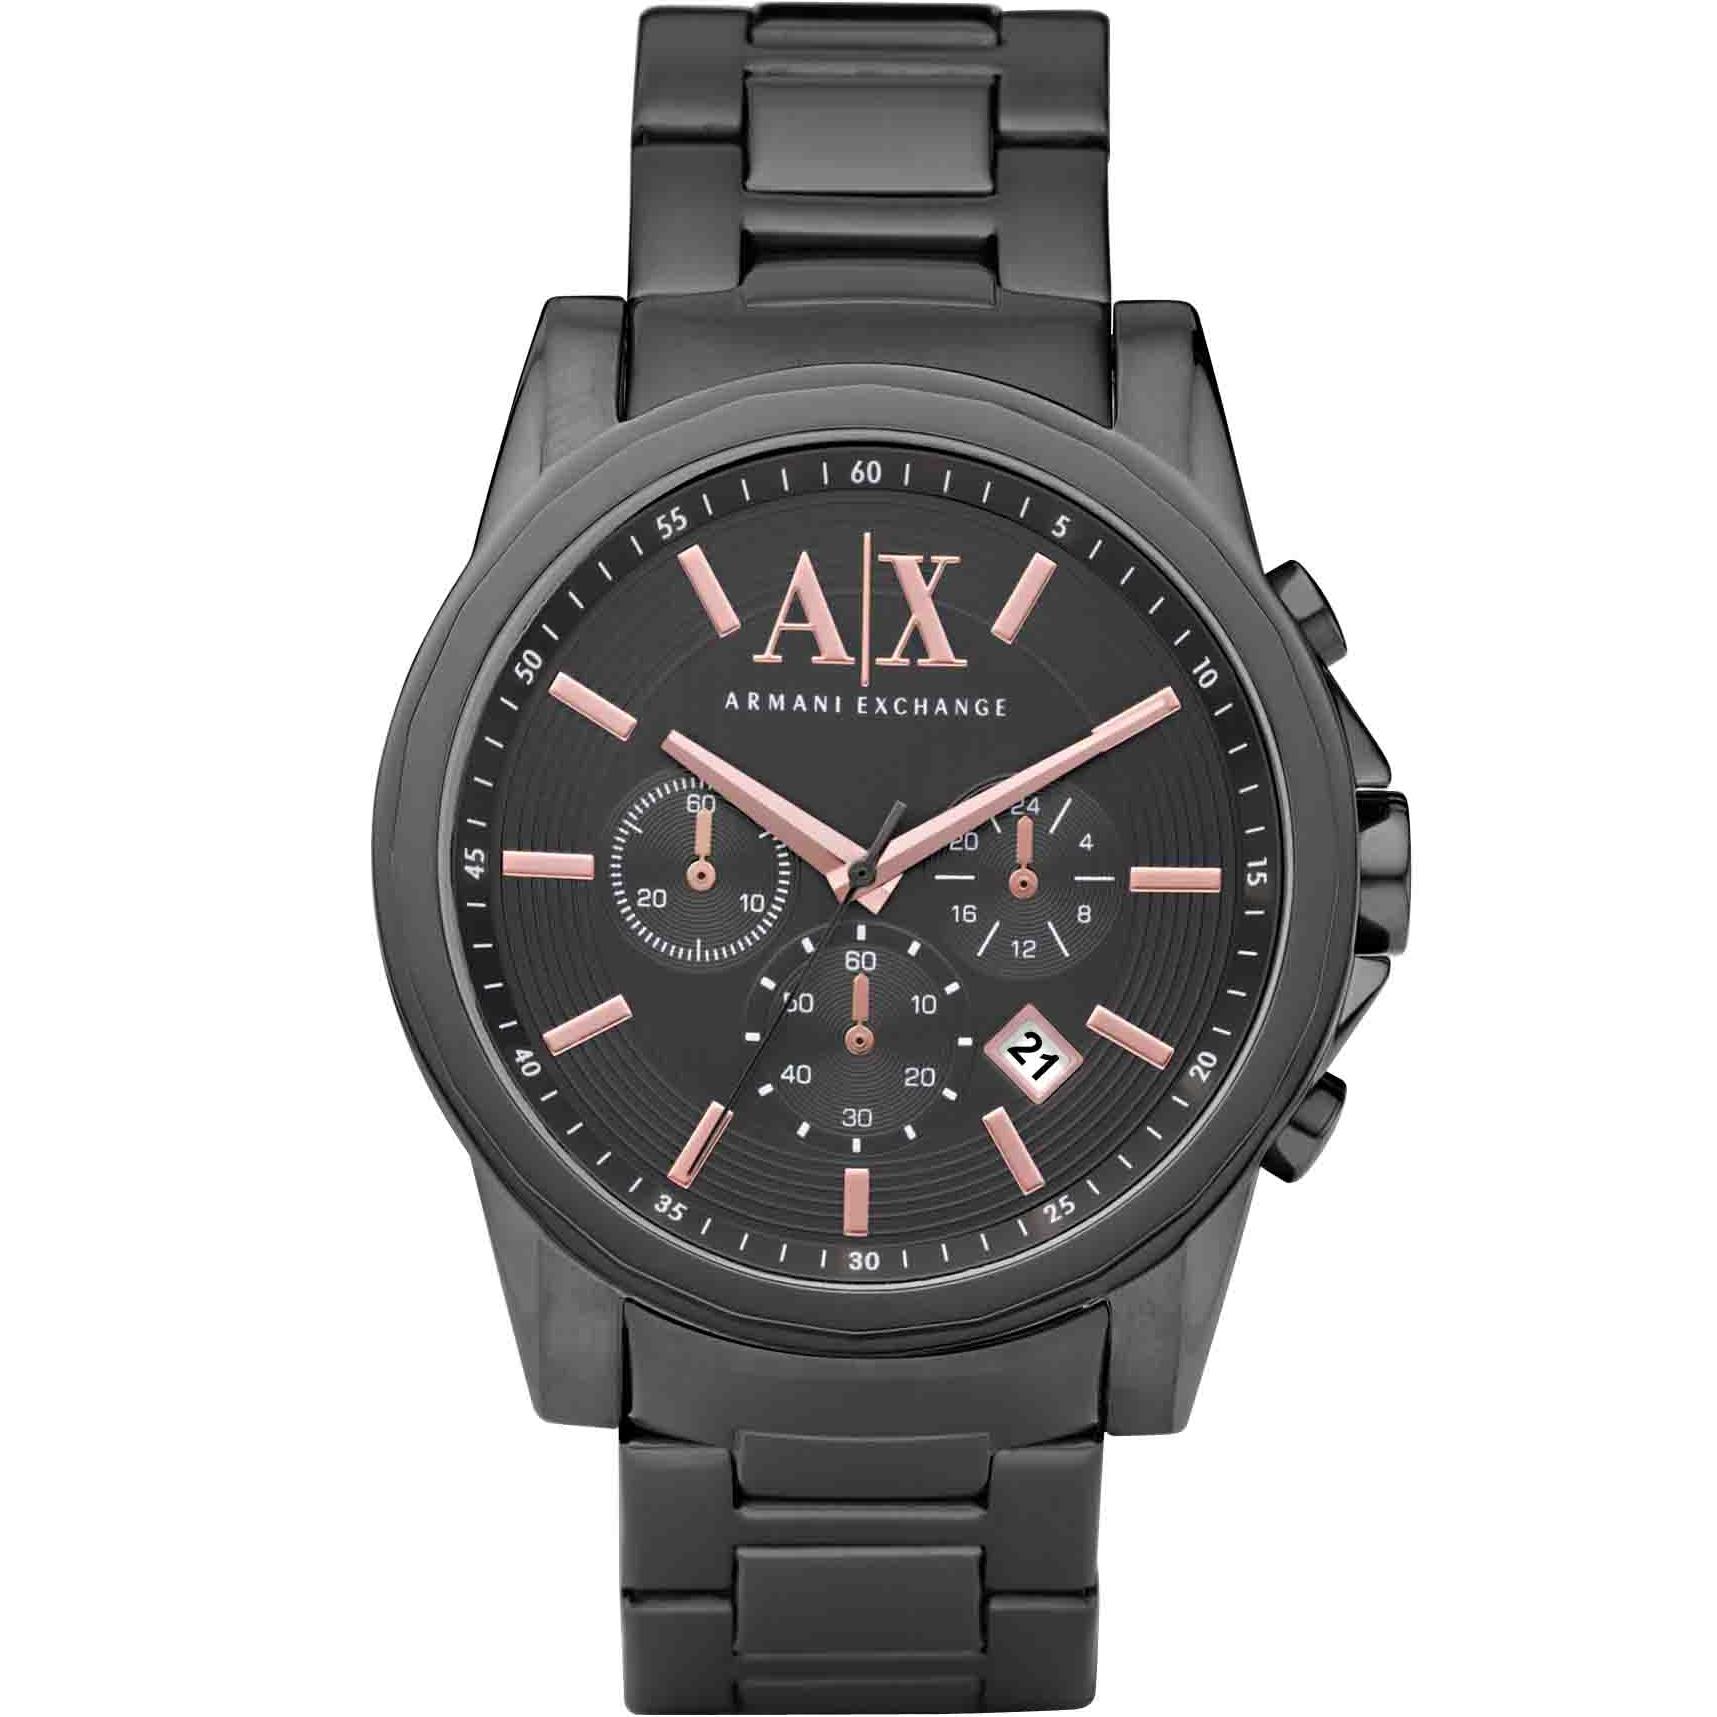 Gents Armani Exchange Chronograph Watch (AX2086)  c2dcbb0206